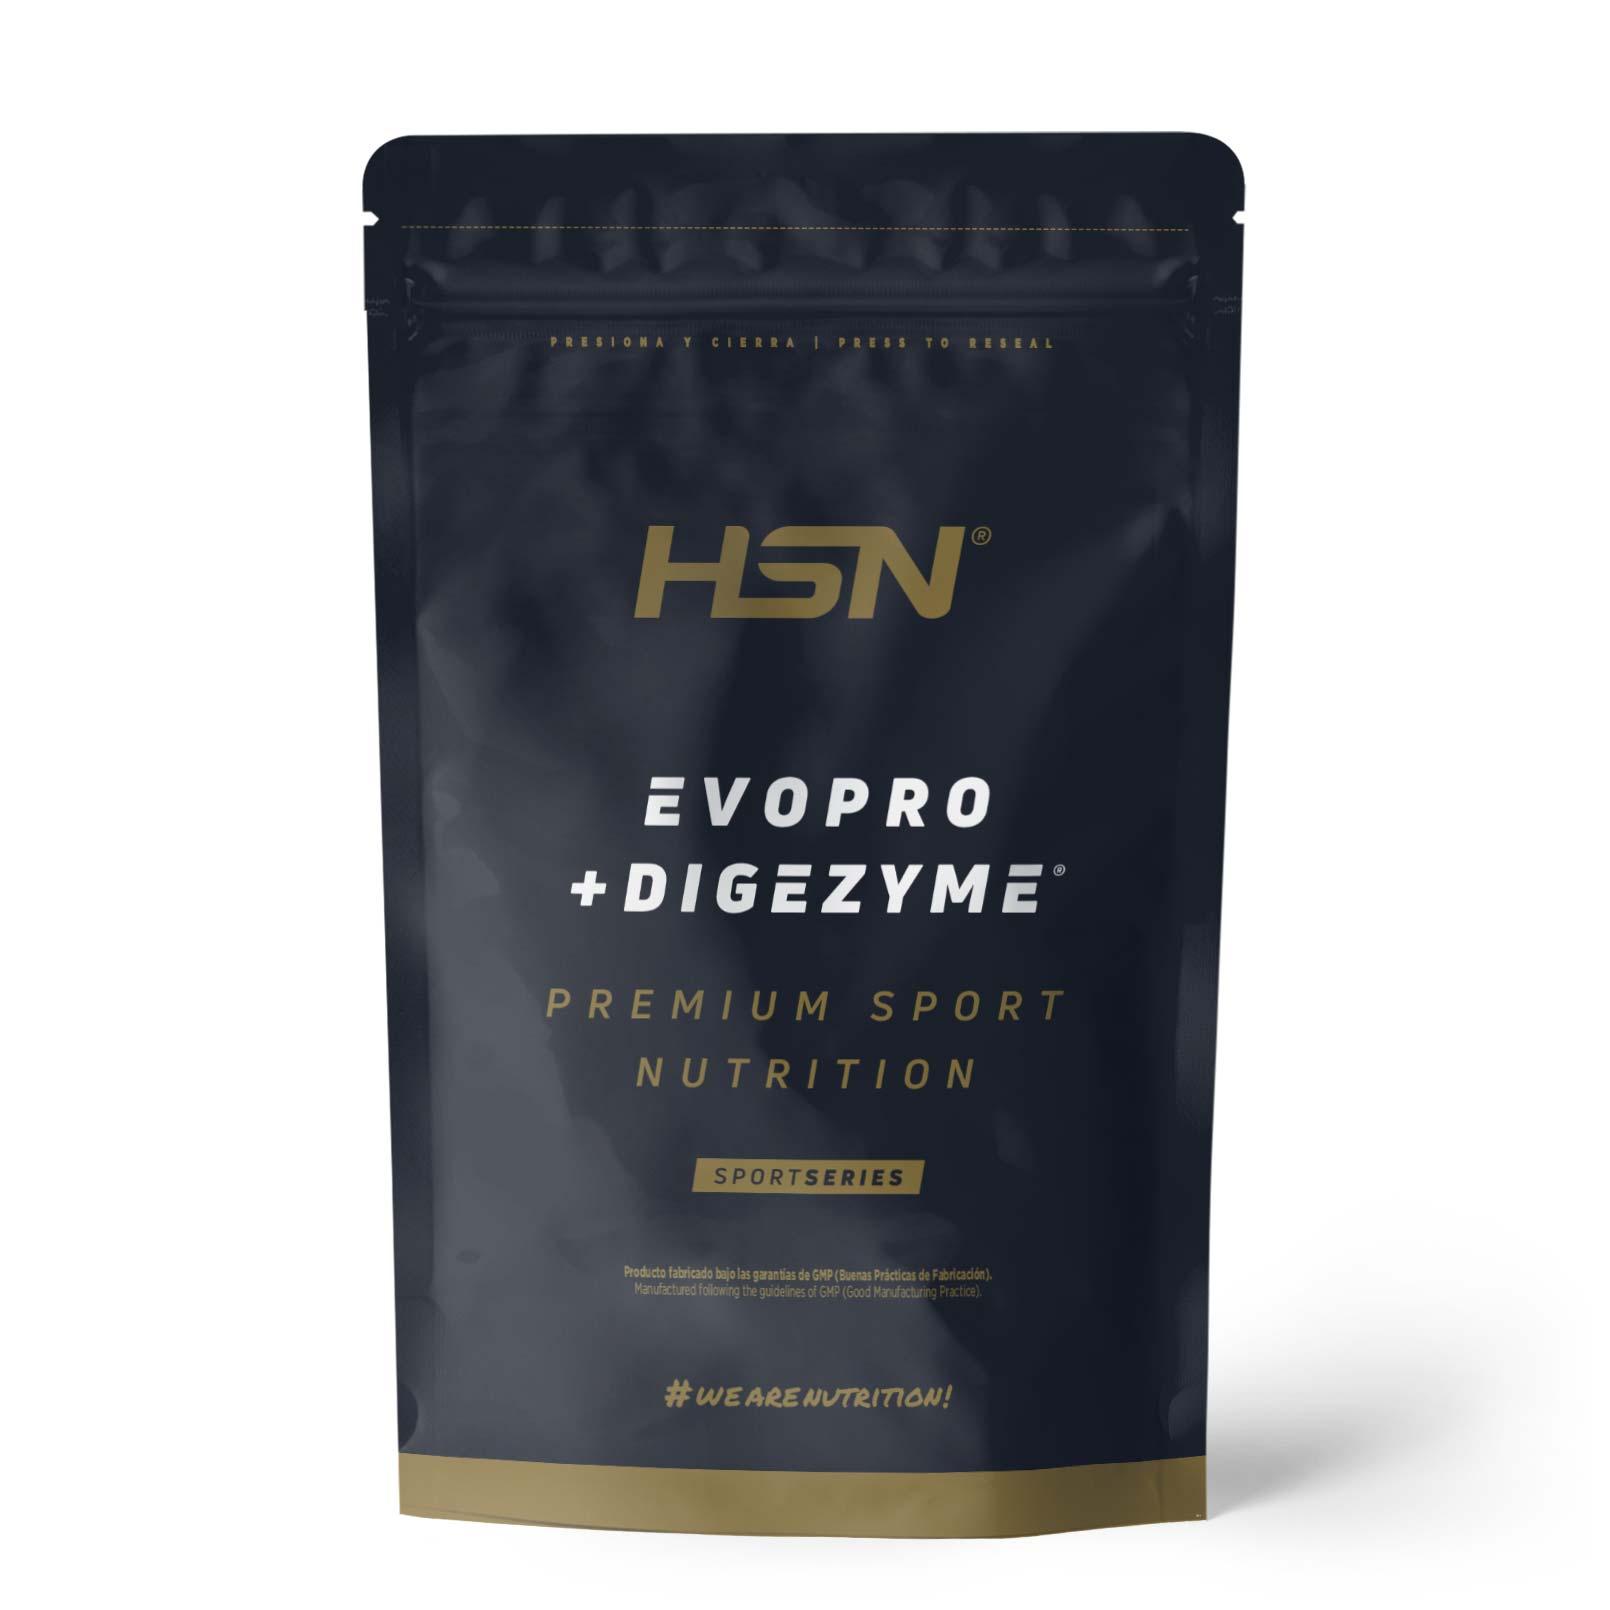 Evopro (Mezcla de proteínas premium) + Digezime